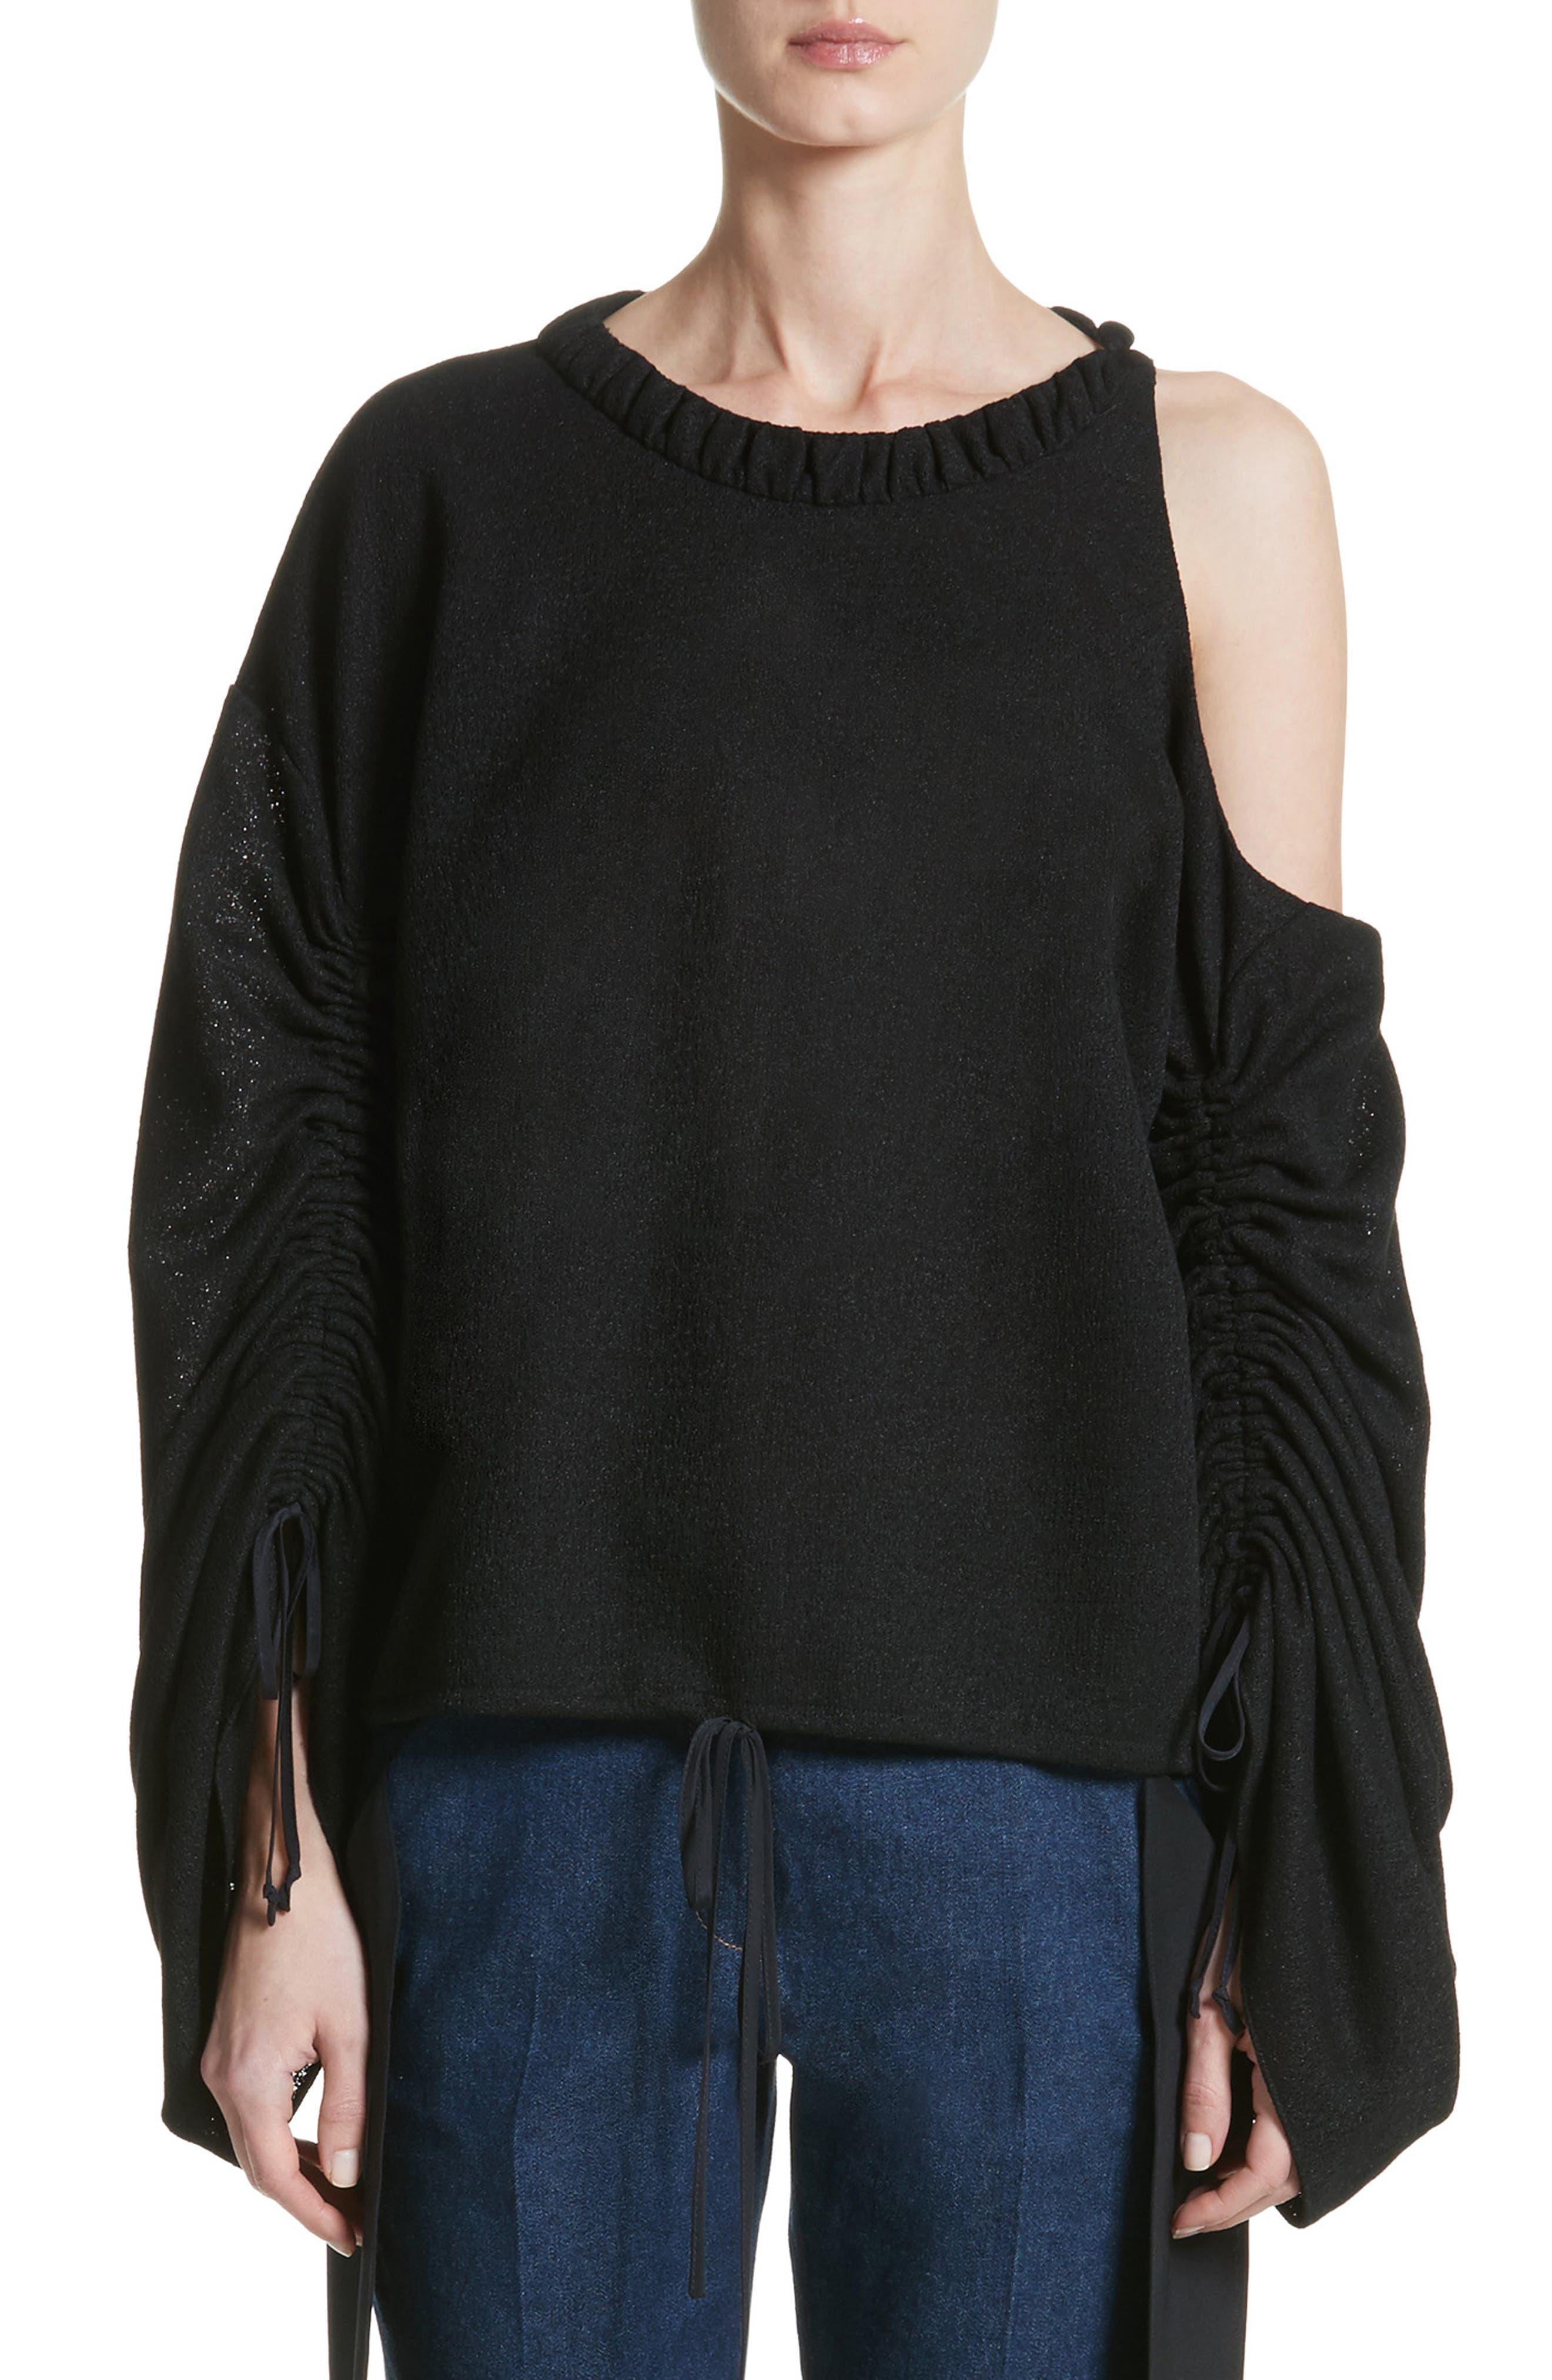 Joshua Cold Shoulder Pullover,                             Main thumbnail 1, color,                             Black